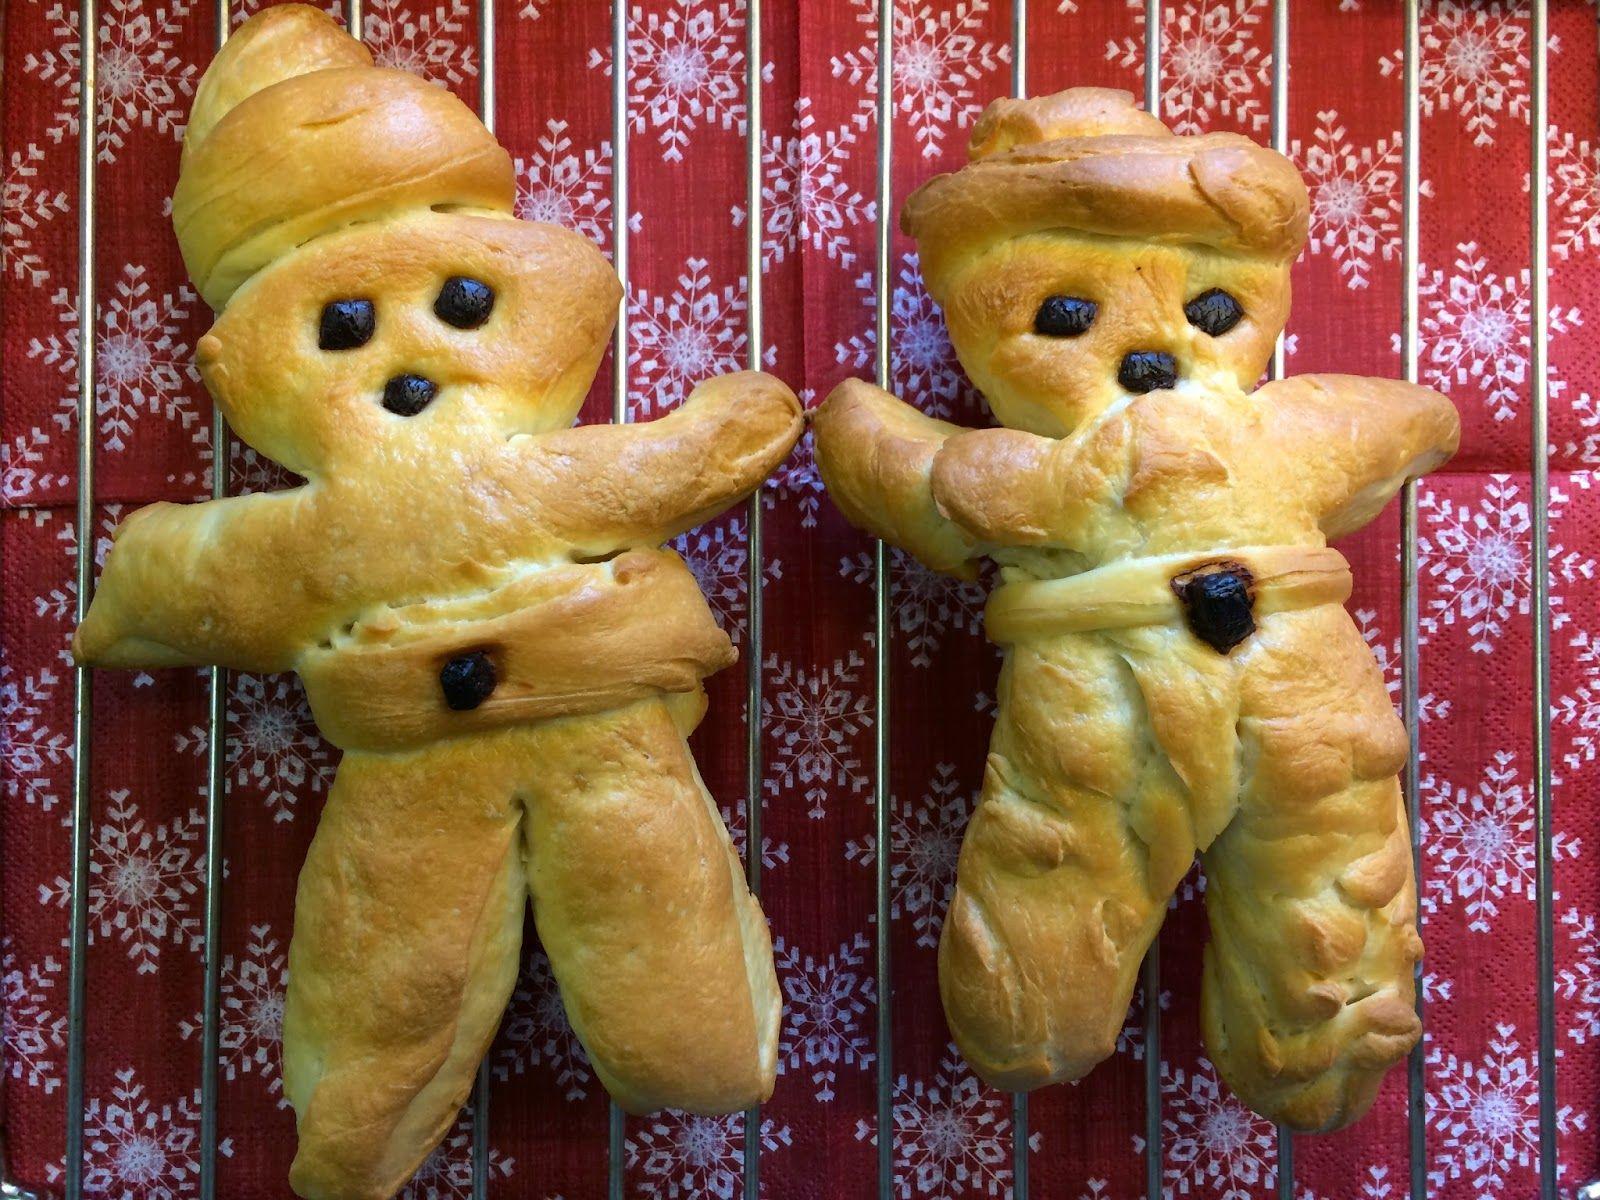 Grittbänze - little Swiss yeast guys